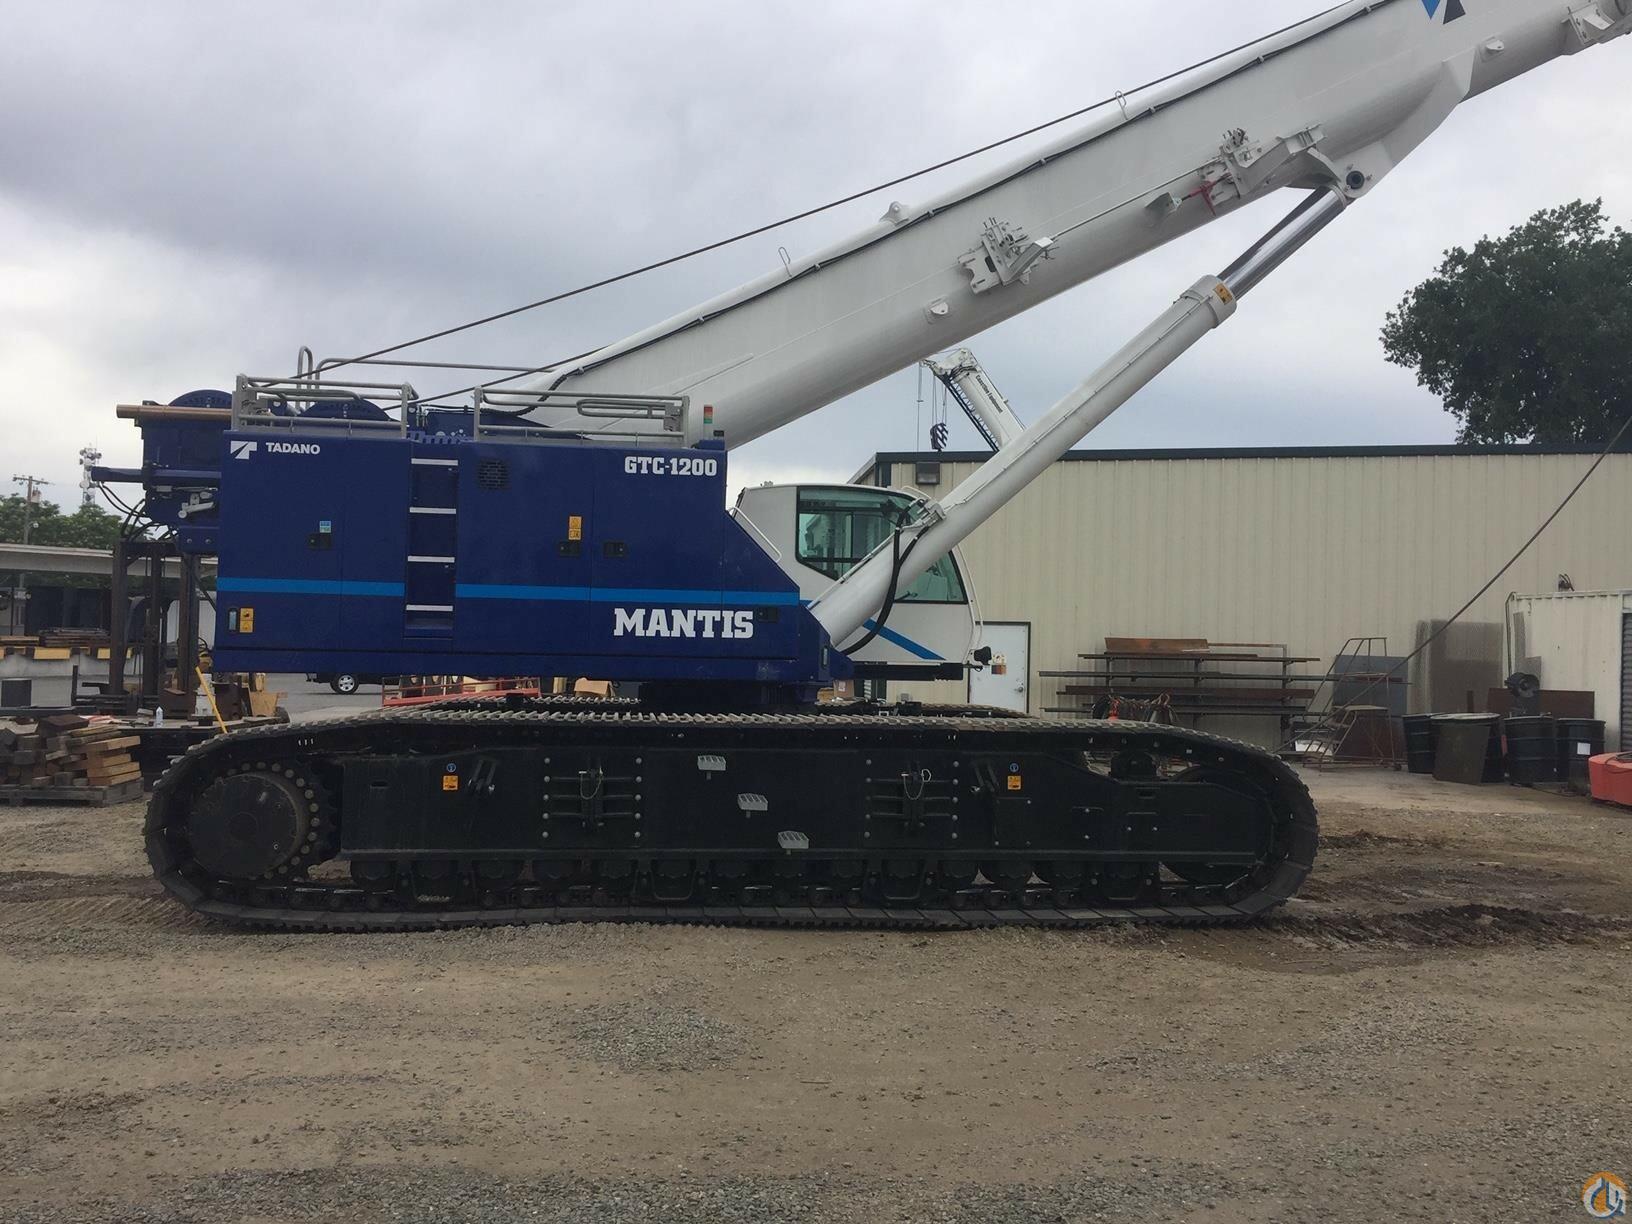 Tadano Mantis GTC-1200